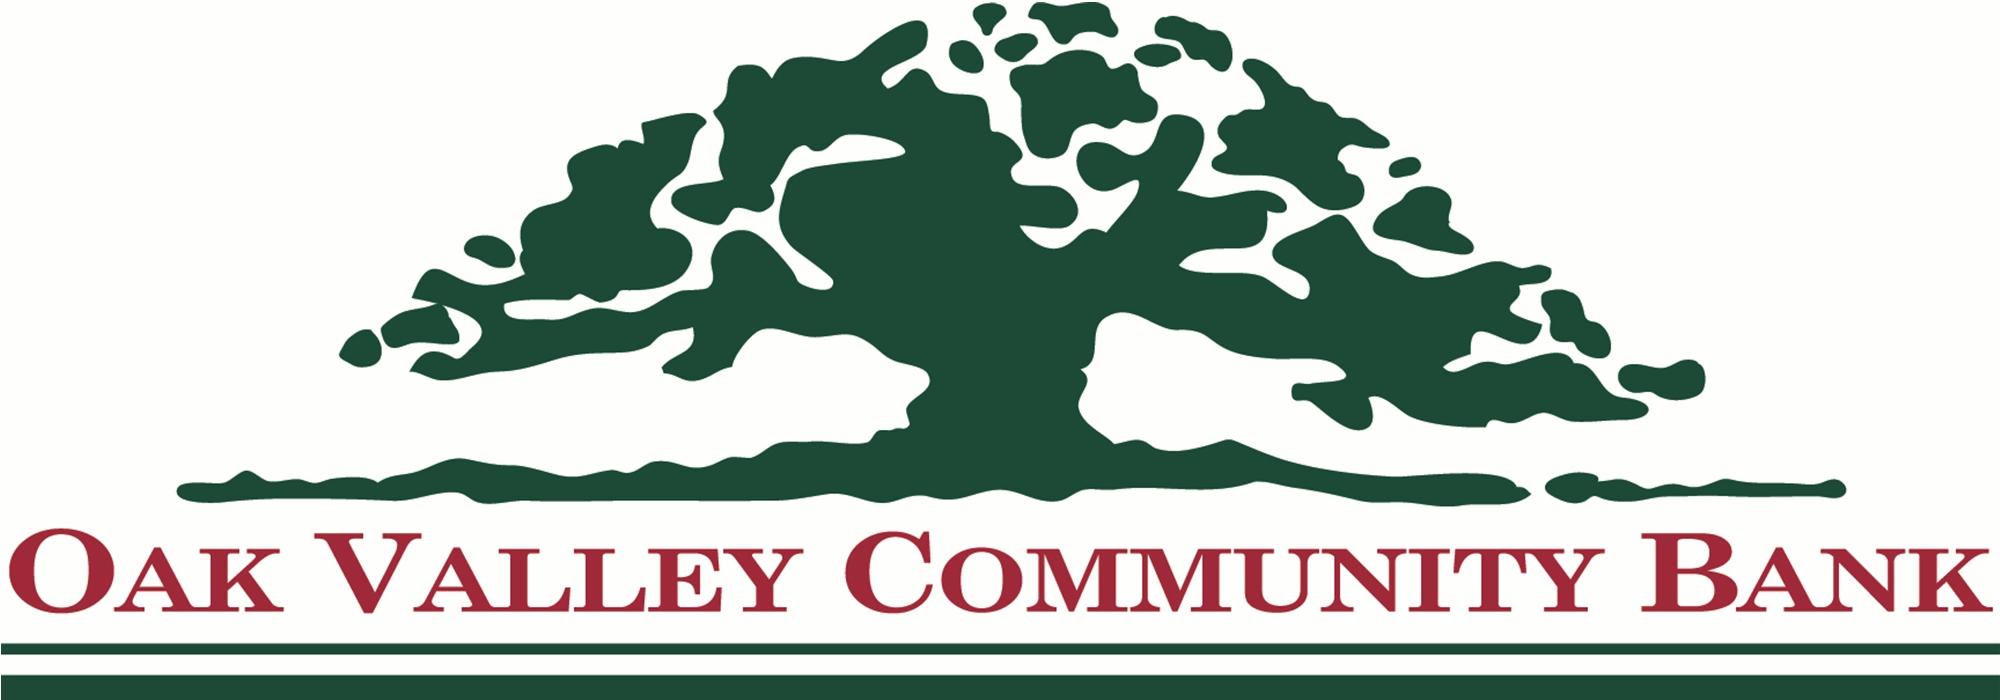 Oak Valley Community Bank